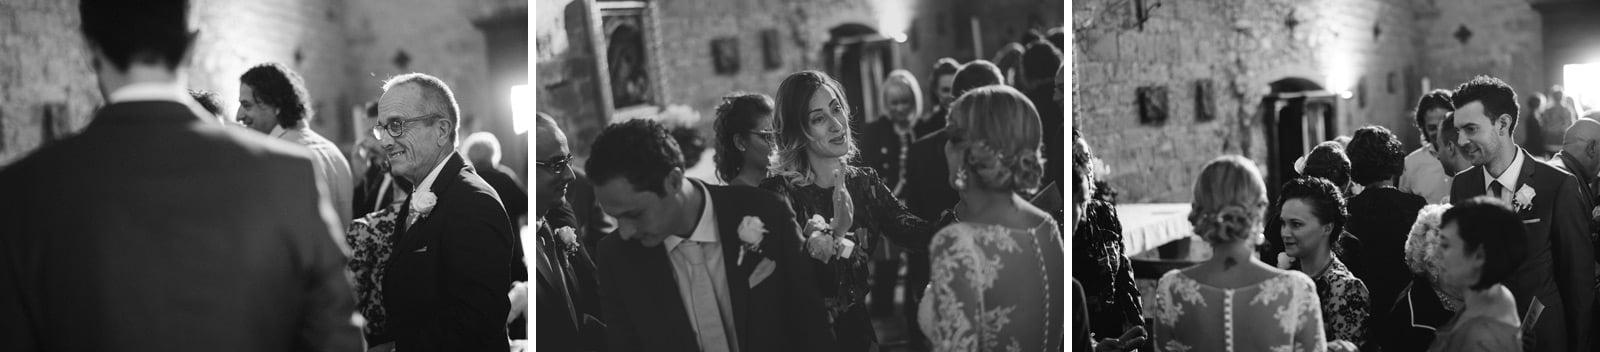 053-wedding-florence-palazzo-borghese